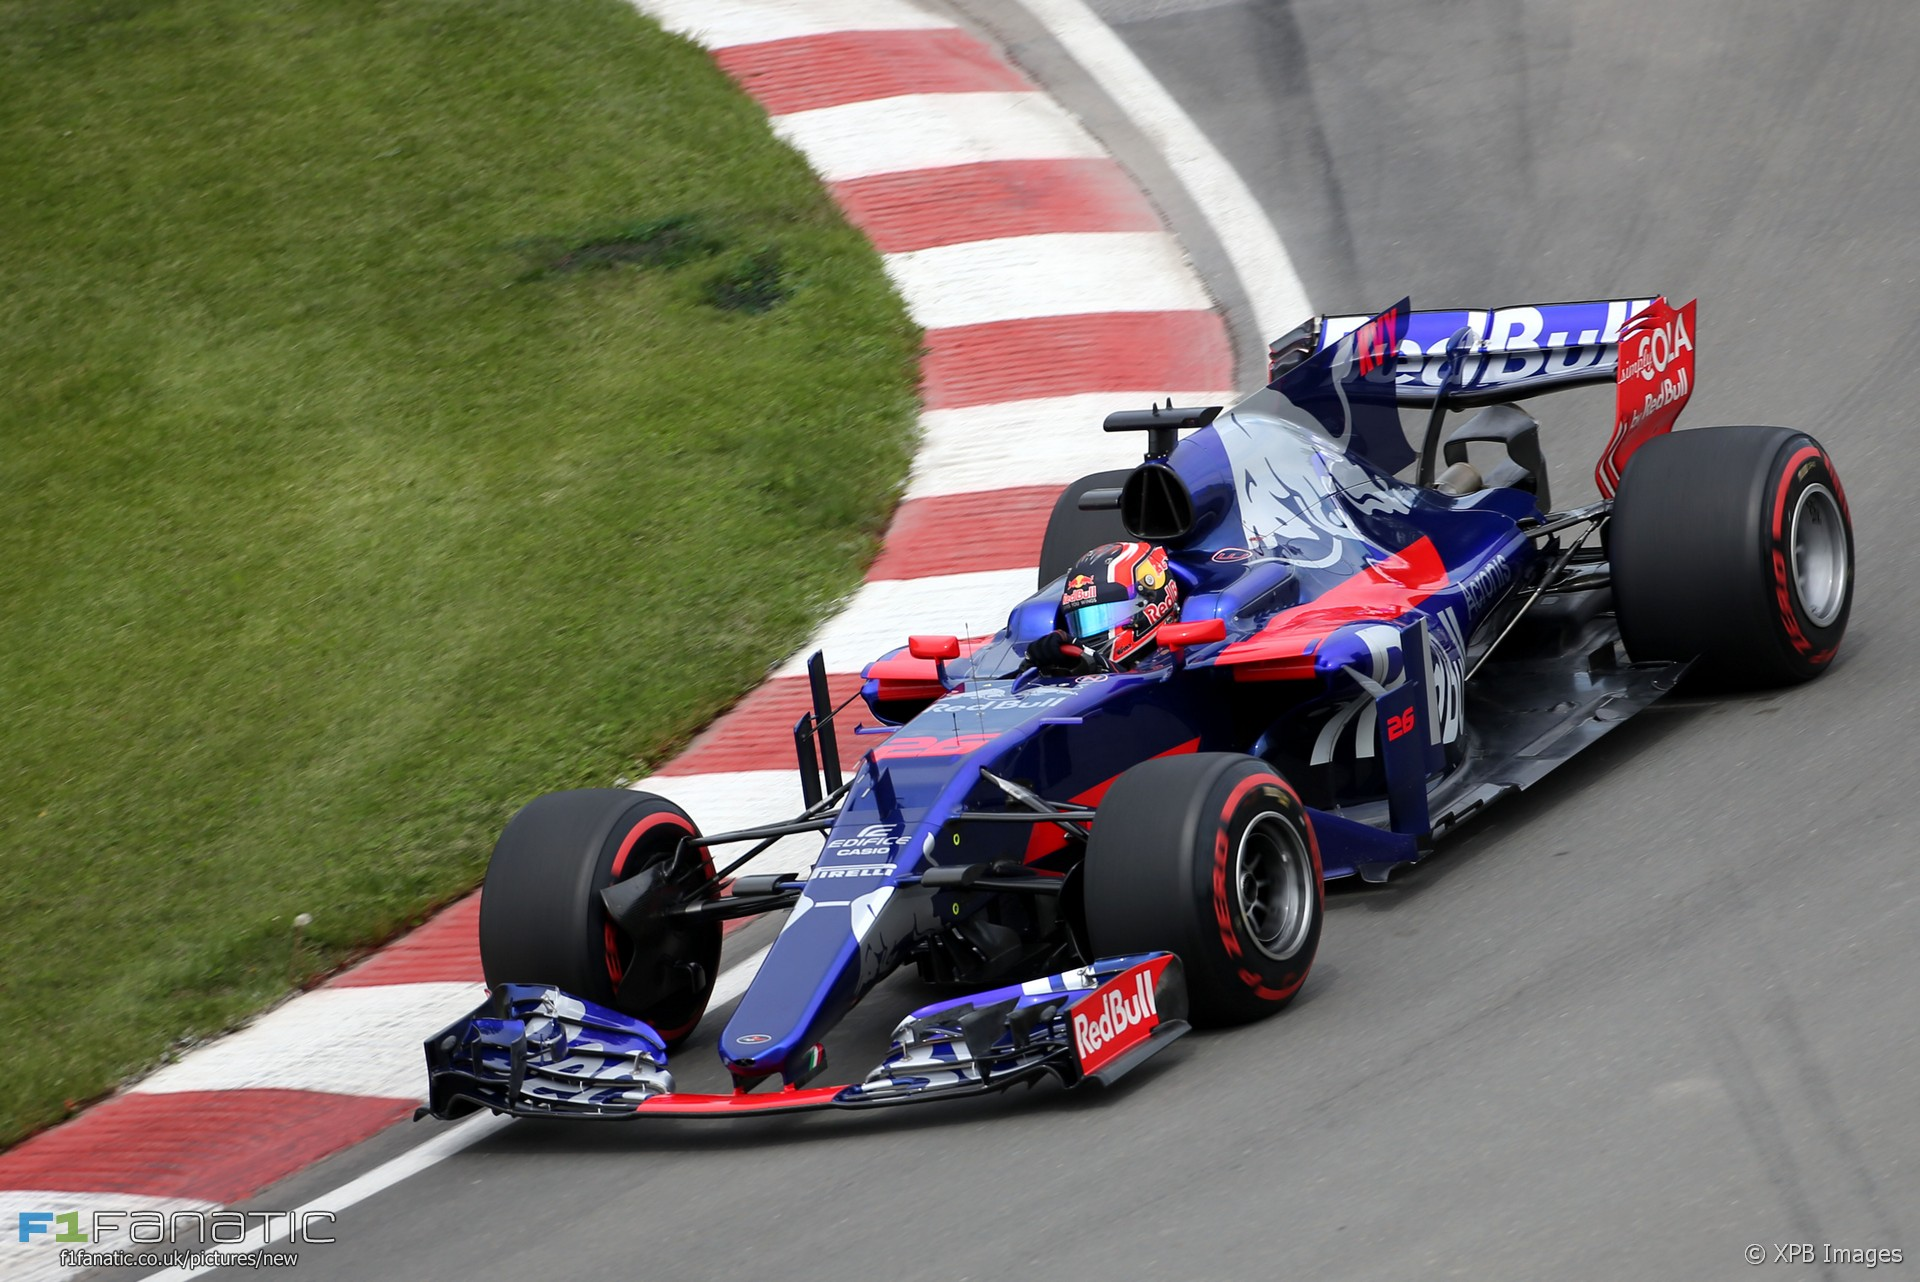 Daniil Kvyat, Toro Rosso, Circuit Gilles Villeneuve, 2017